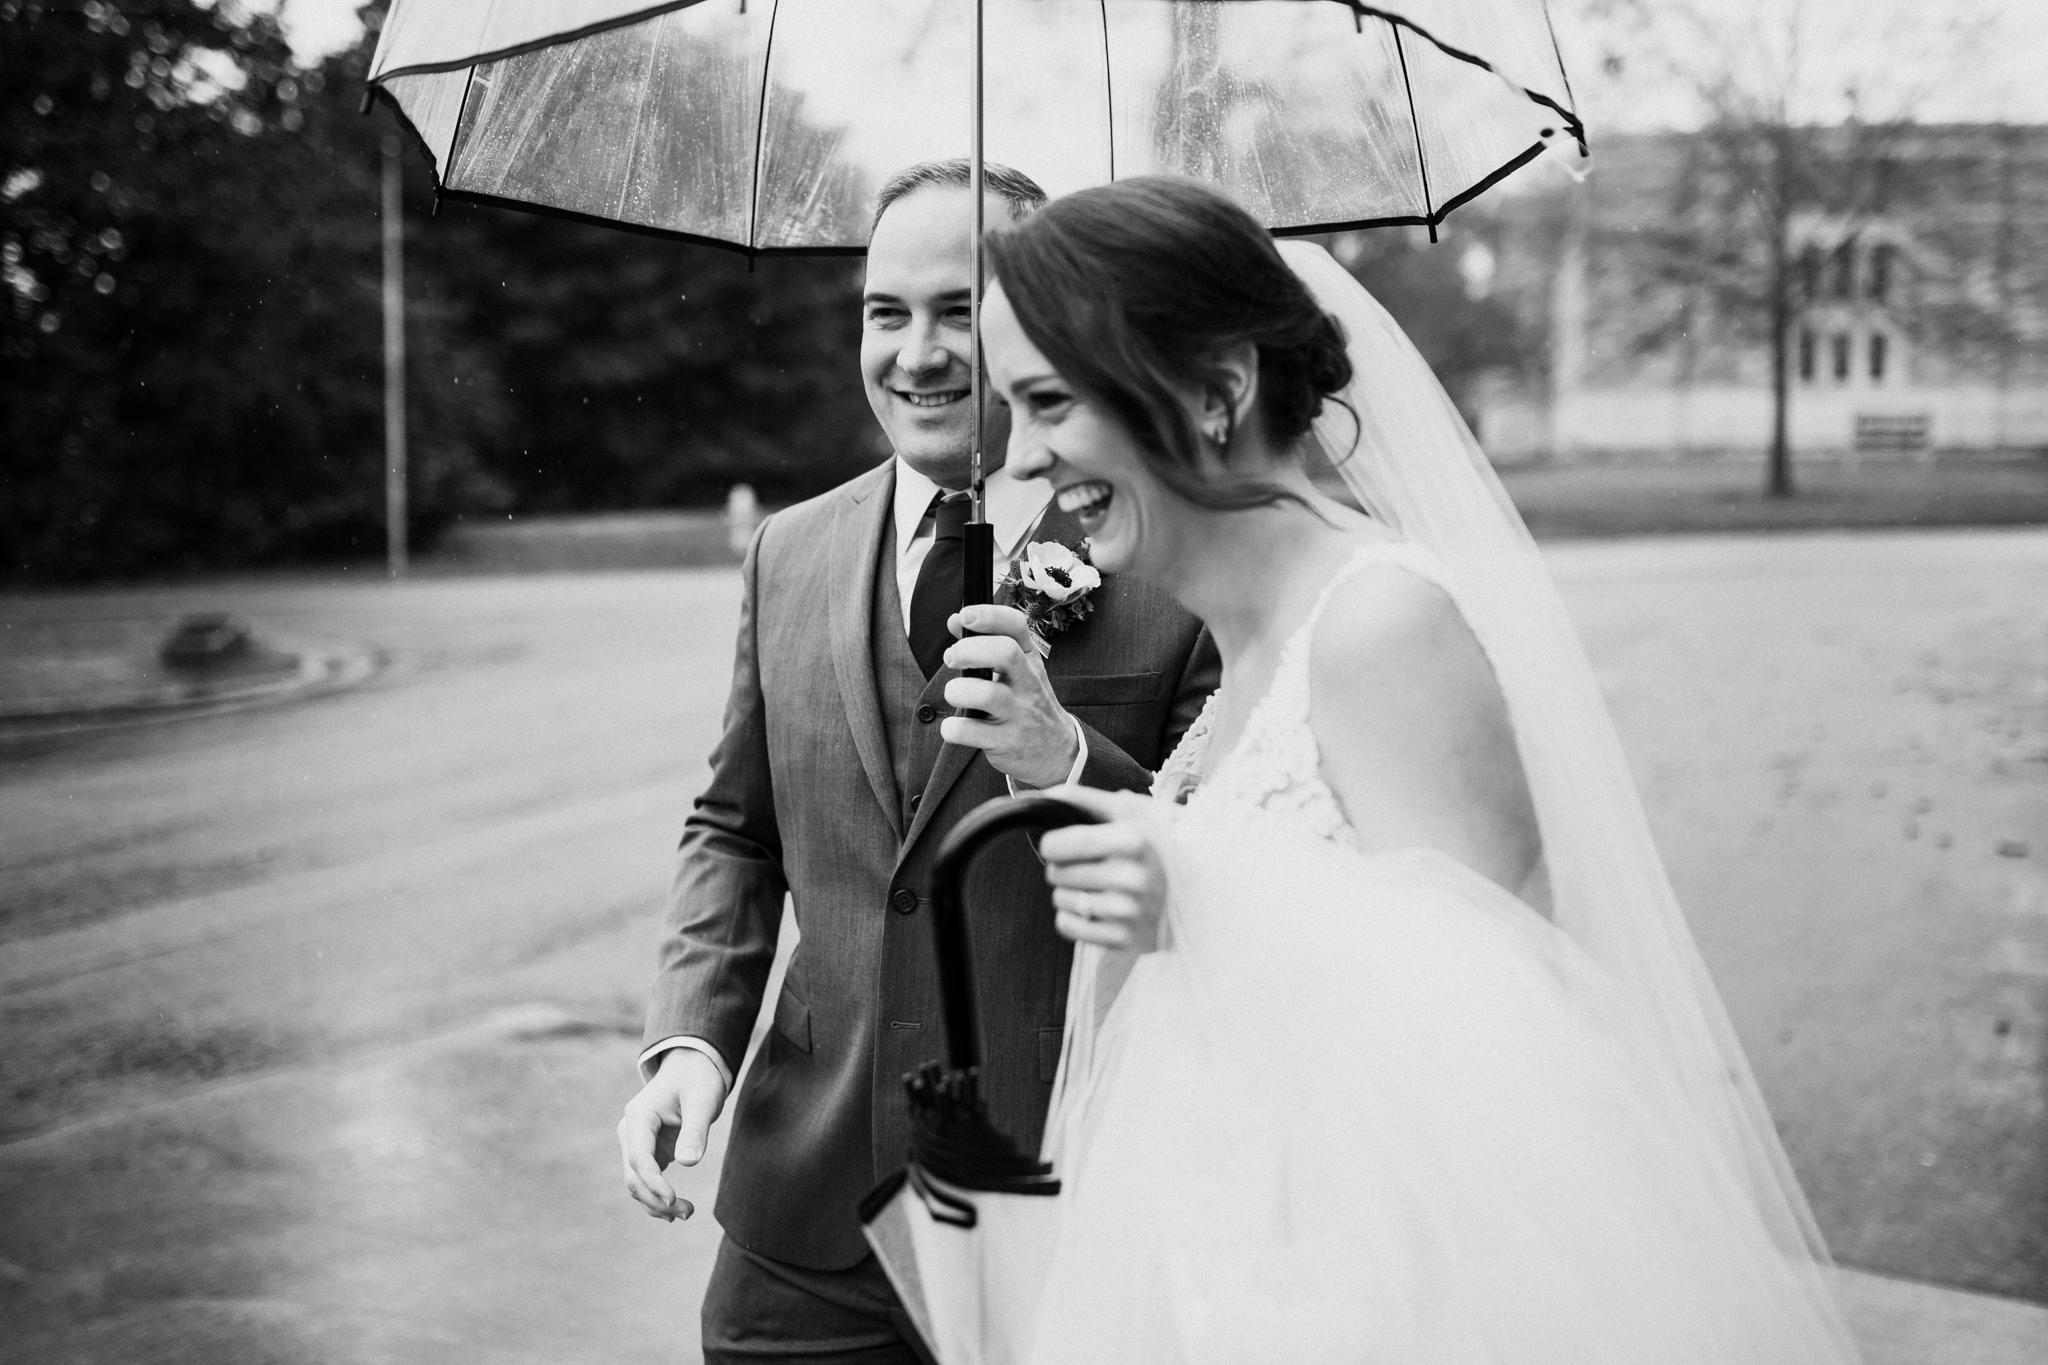 birmingham-alabama-wedding-photographer-laura-terry-the-warmth-around-you (68 of 110).jpg